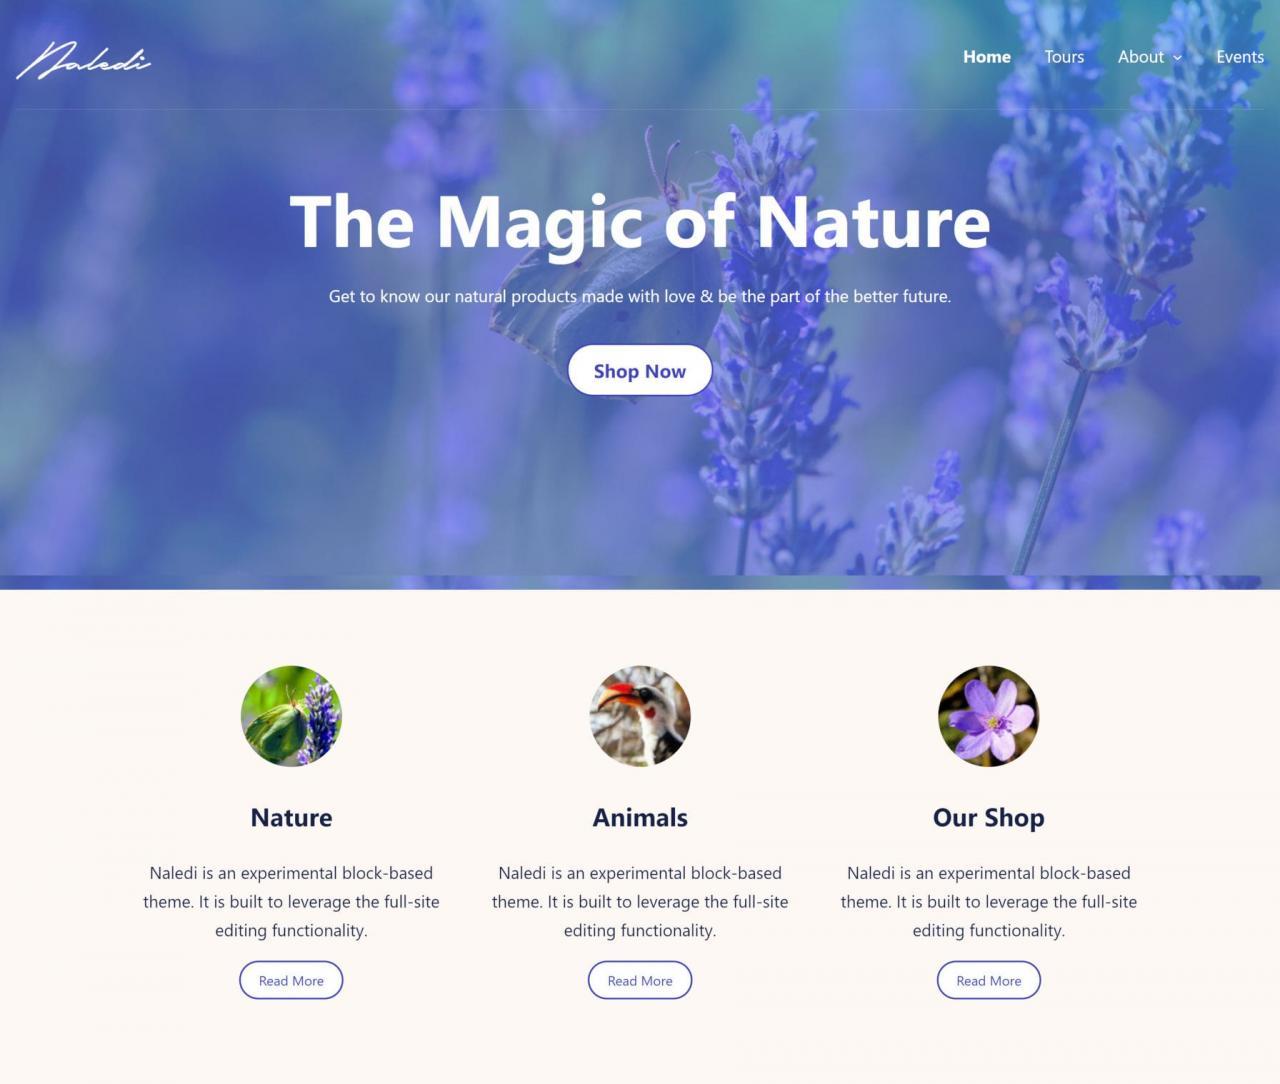 anariel设计推出naledi一个基于块的wordpress主题Anariel Design推出Naledi,这是一个基于块的WordPress主题